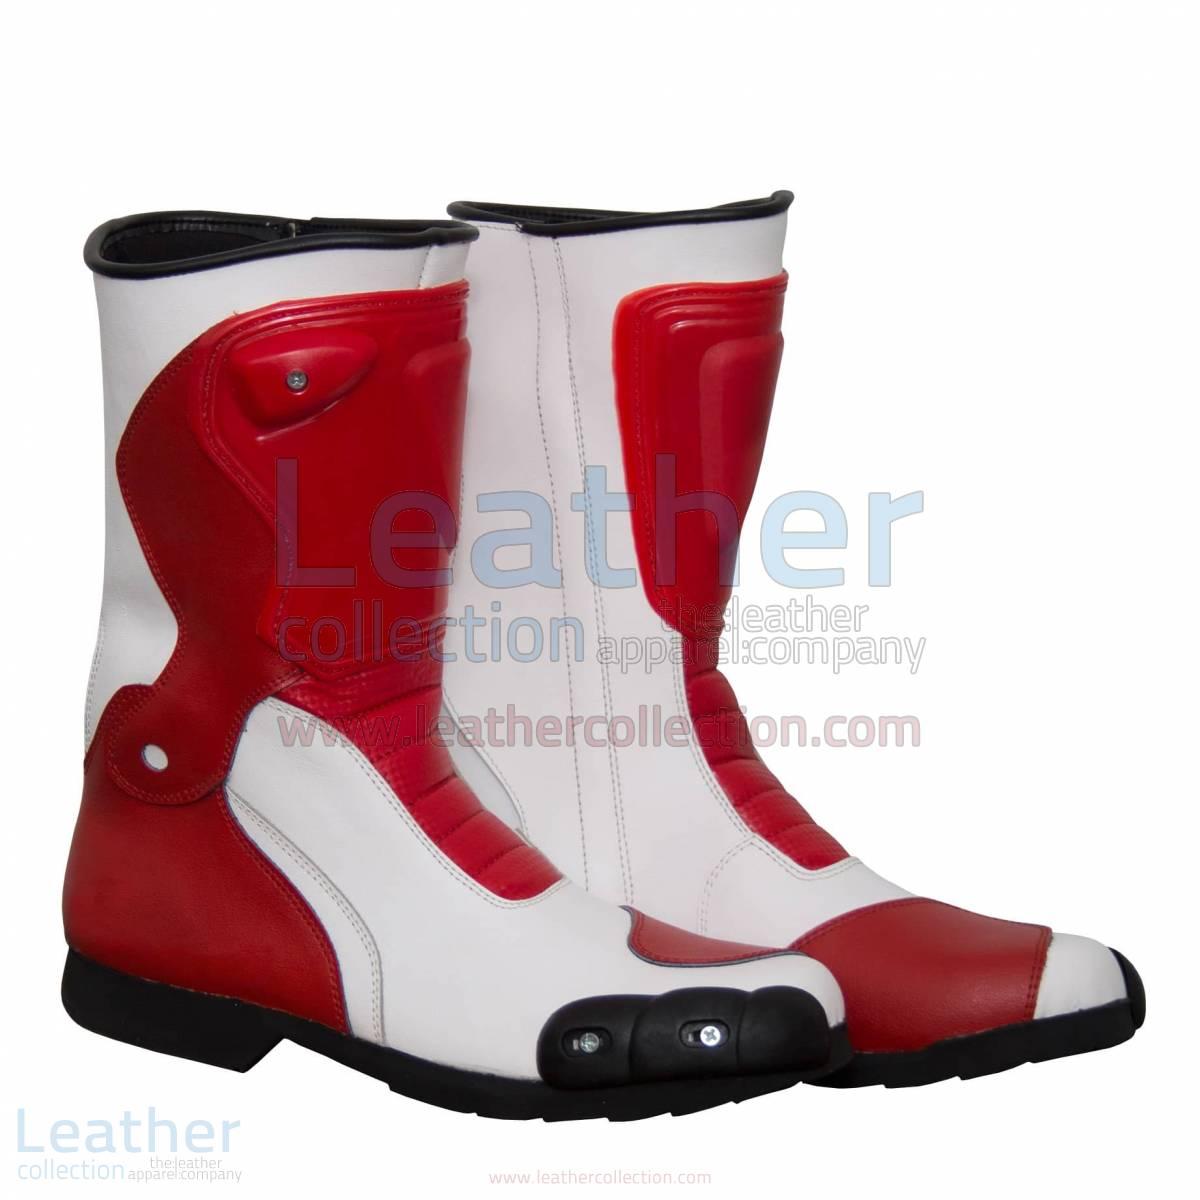 Marco Simoncelli Motorbike Riding Boots